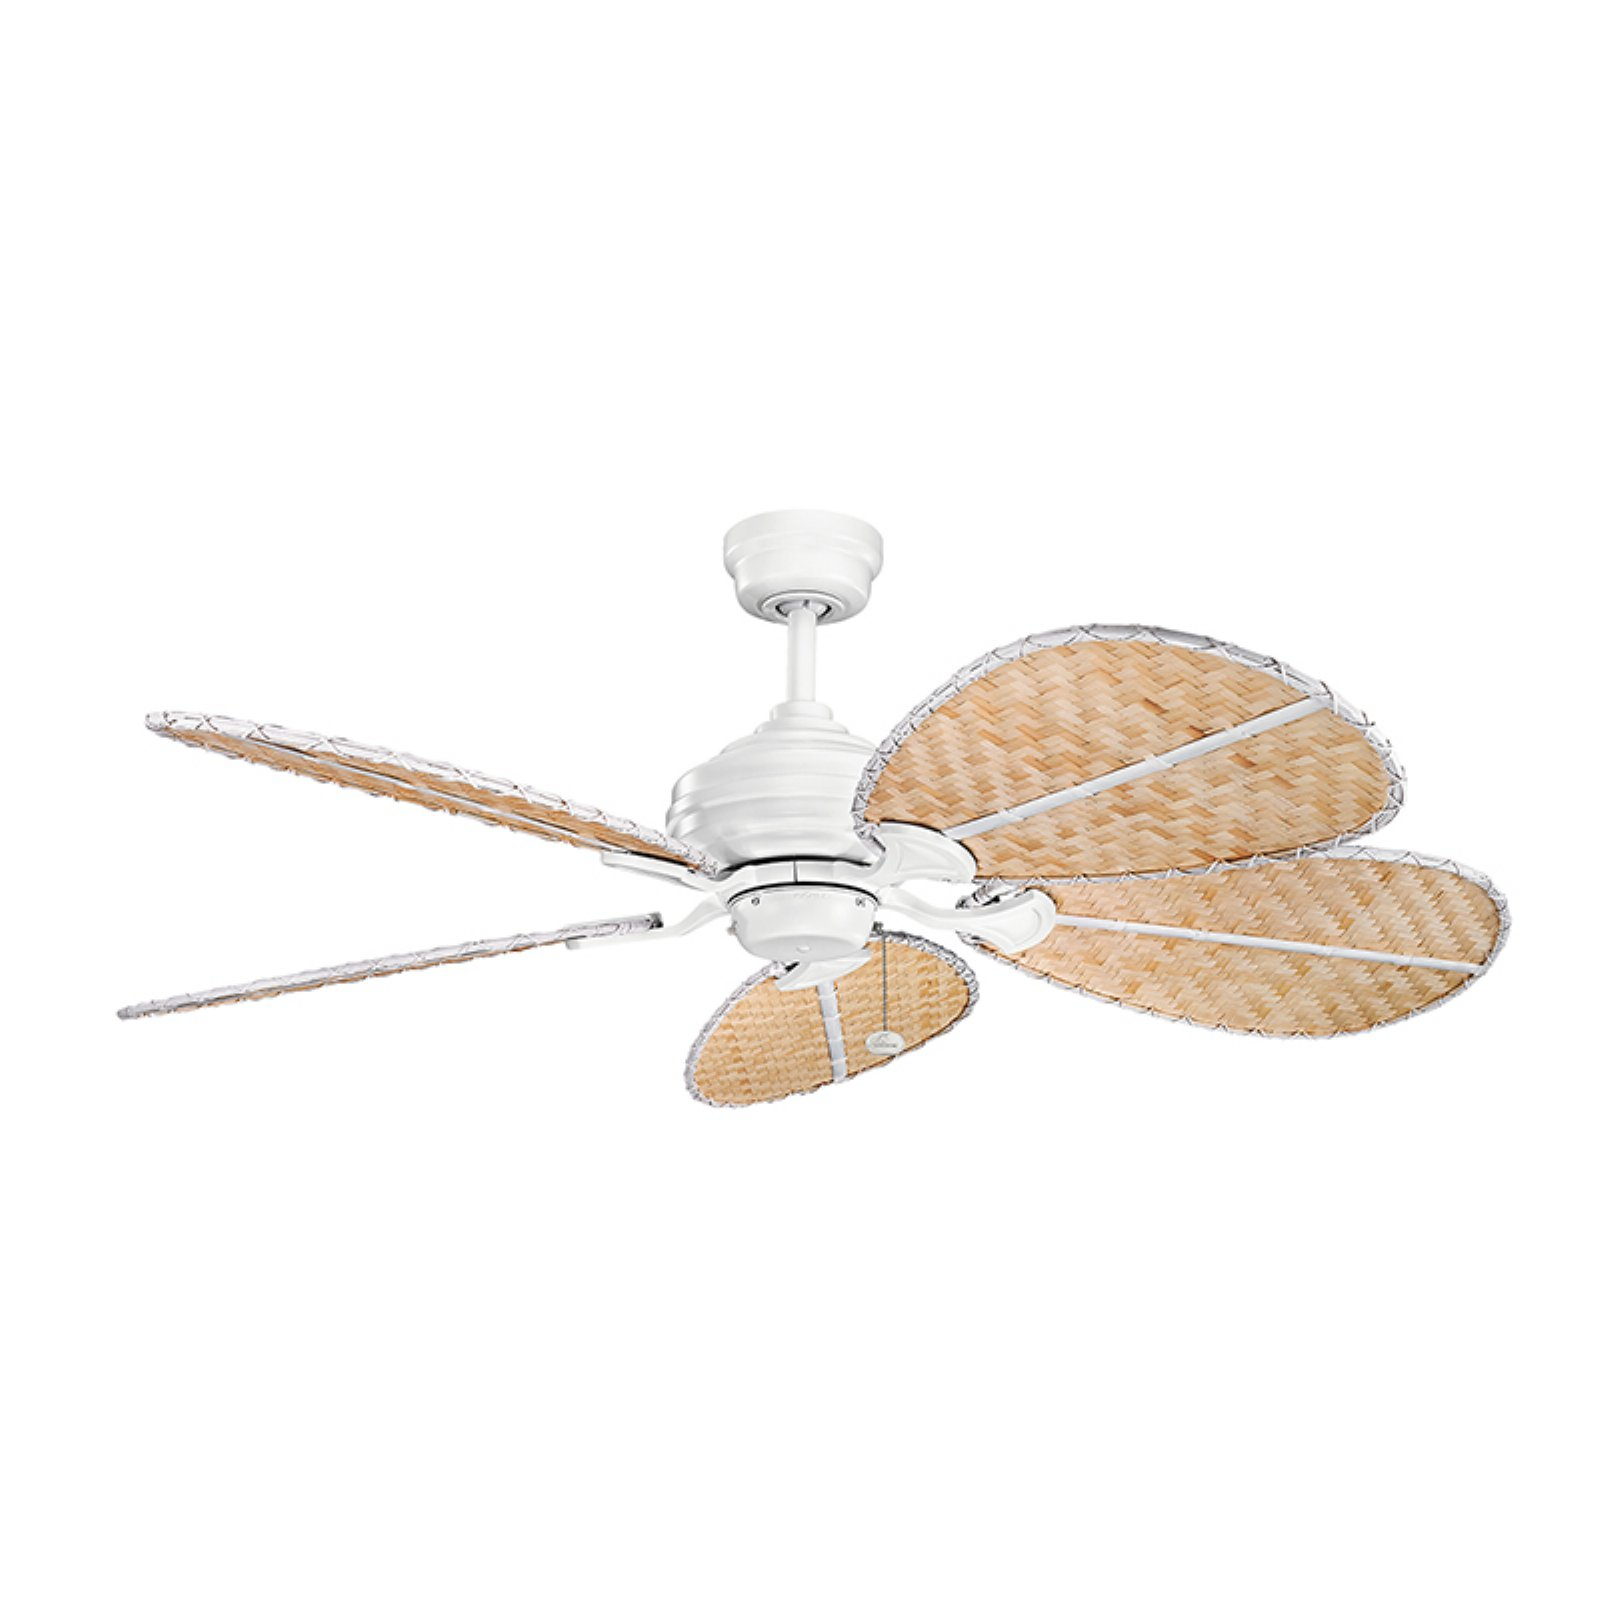 kichler klever natural bamboo oval blade set ceiling fan blades outdoor fans 6